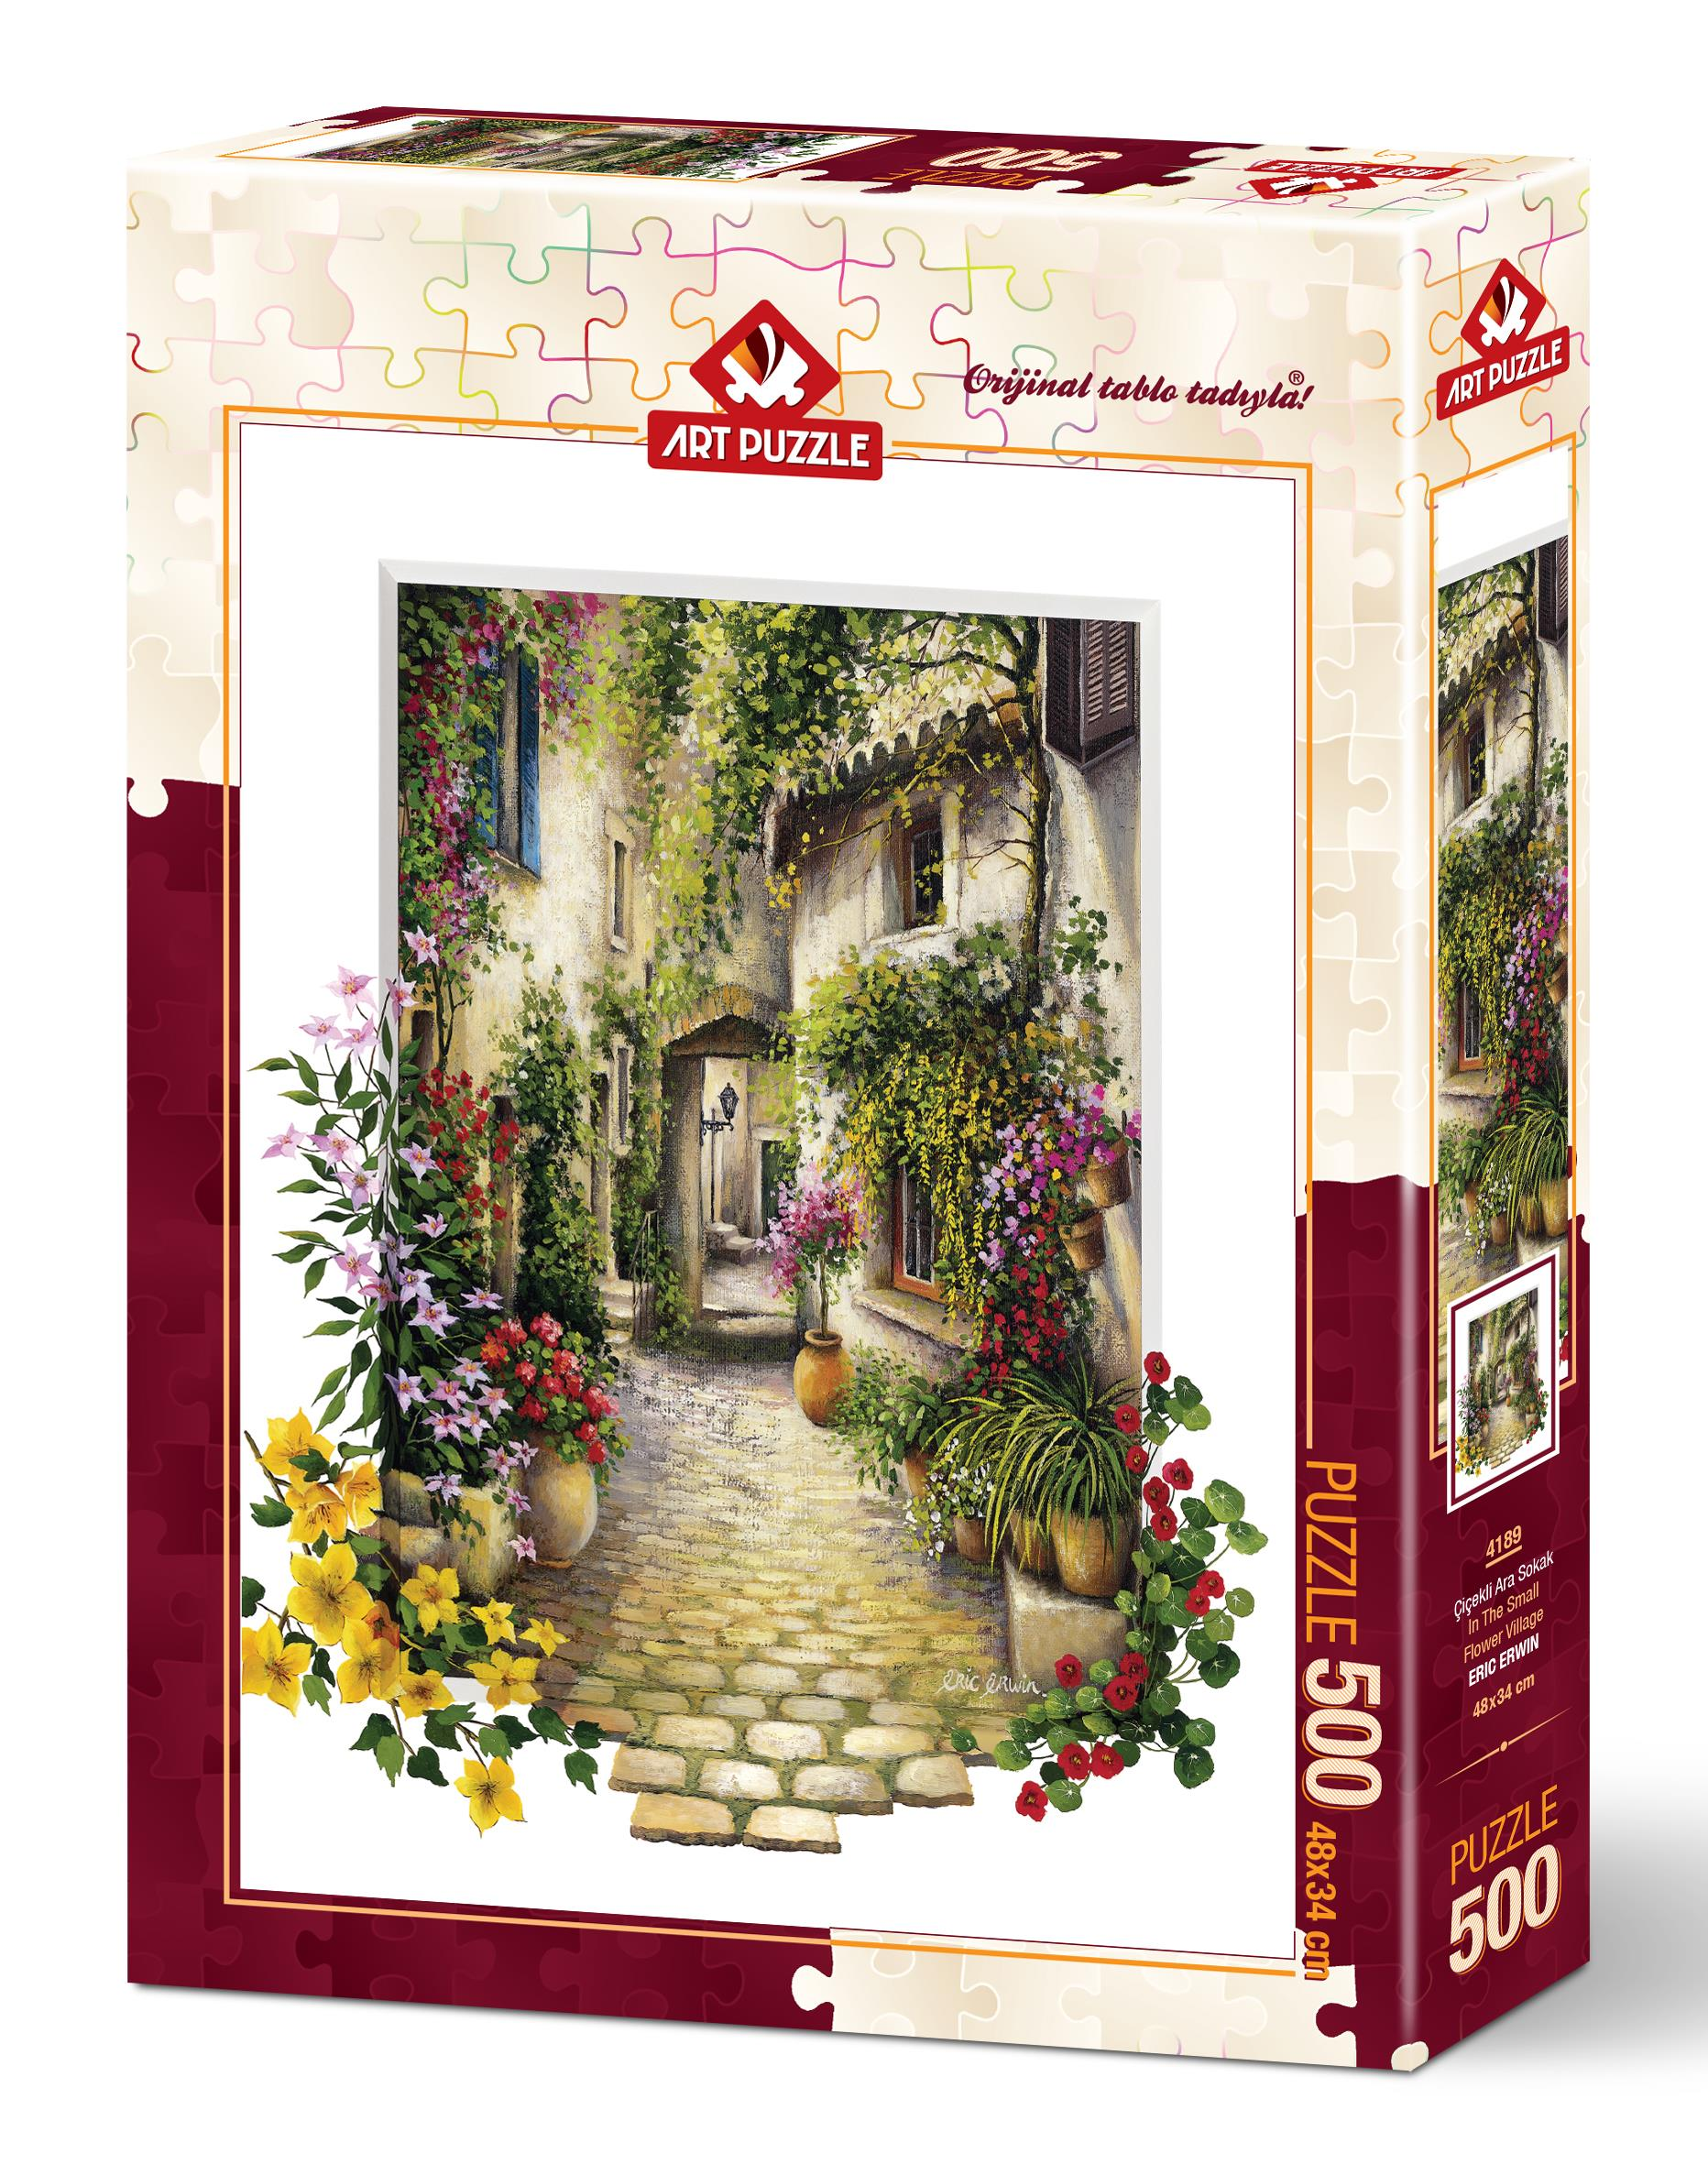 Art Puzzle 4189 Çiçekli Ara Sokak 500 Parça Puzzle